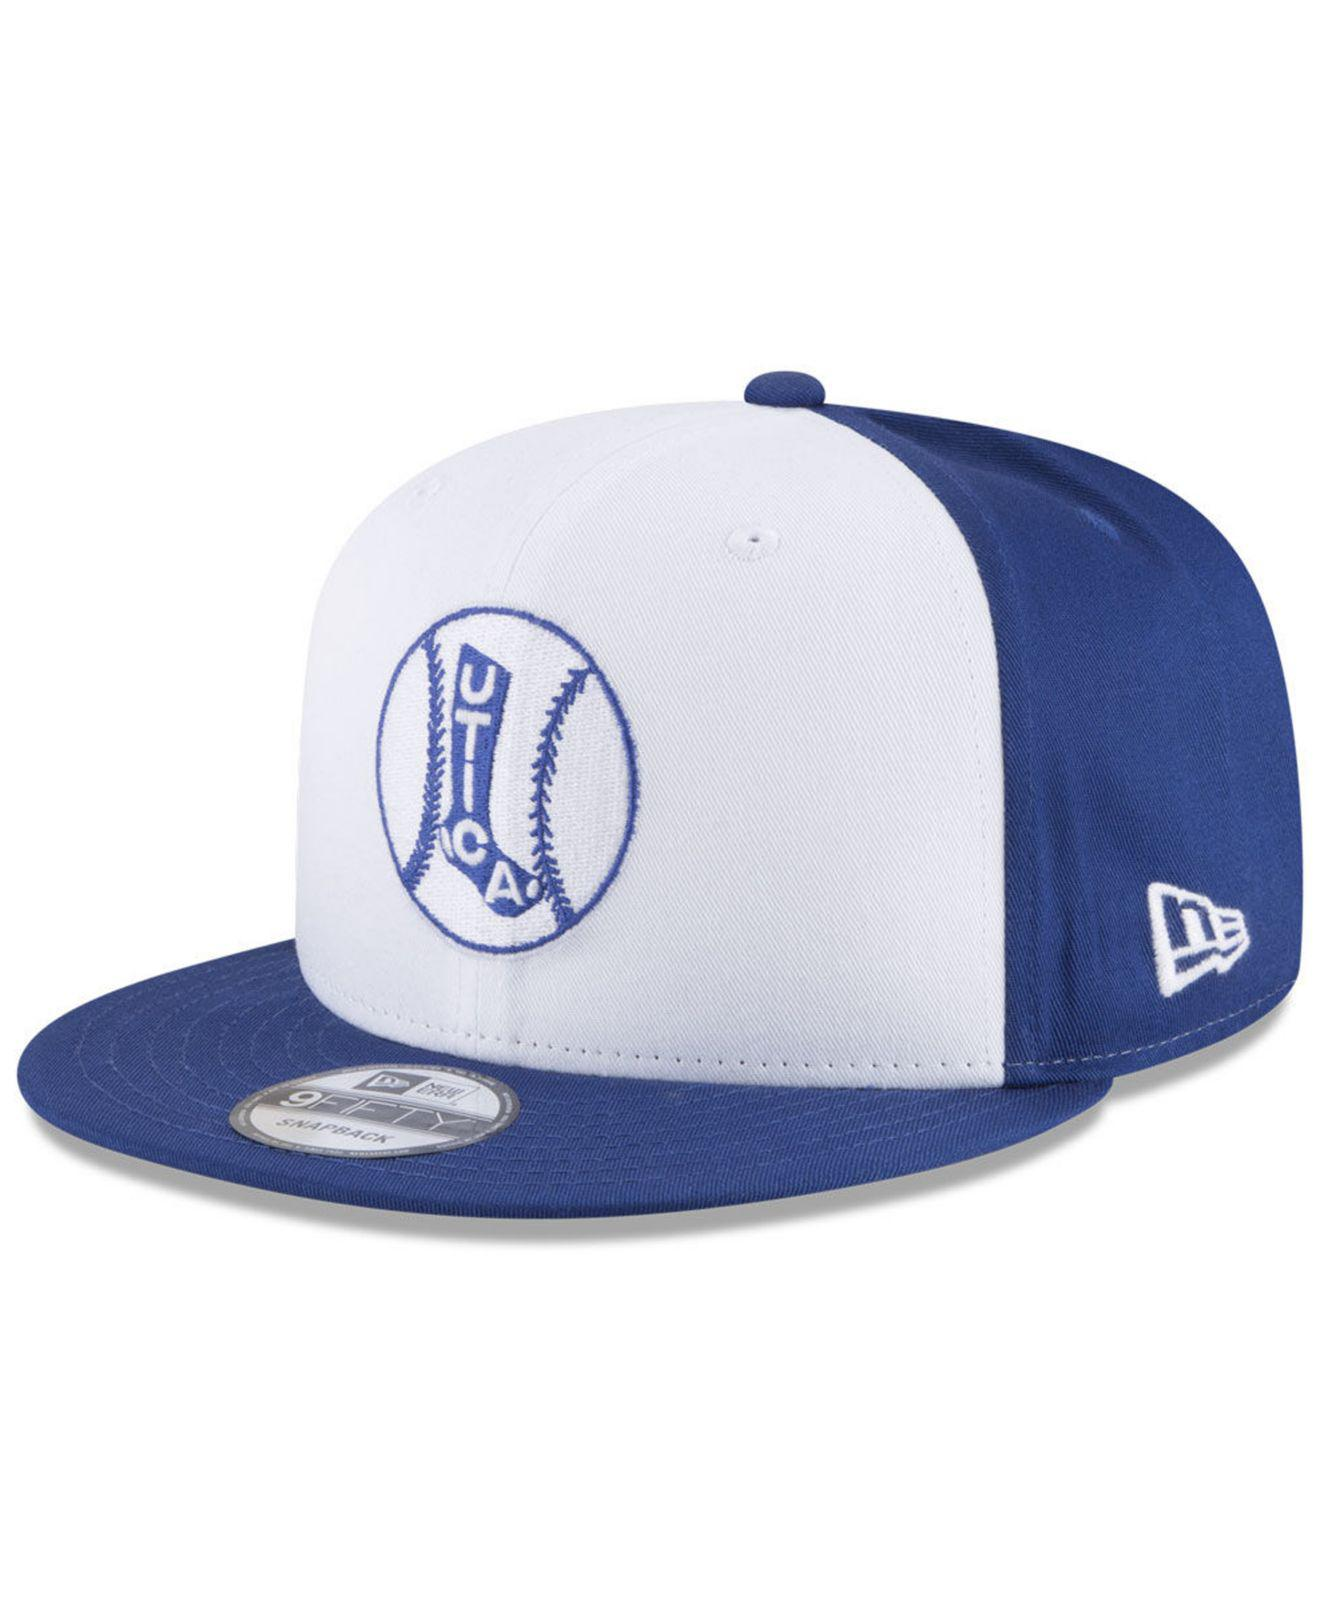 cheaper e955d c80a8 KTZ Utica Blue Sox Hometown 9fifty Snapback Cap in Blue for Men - Lyst